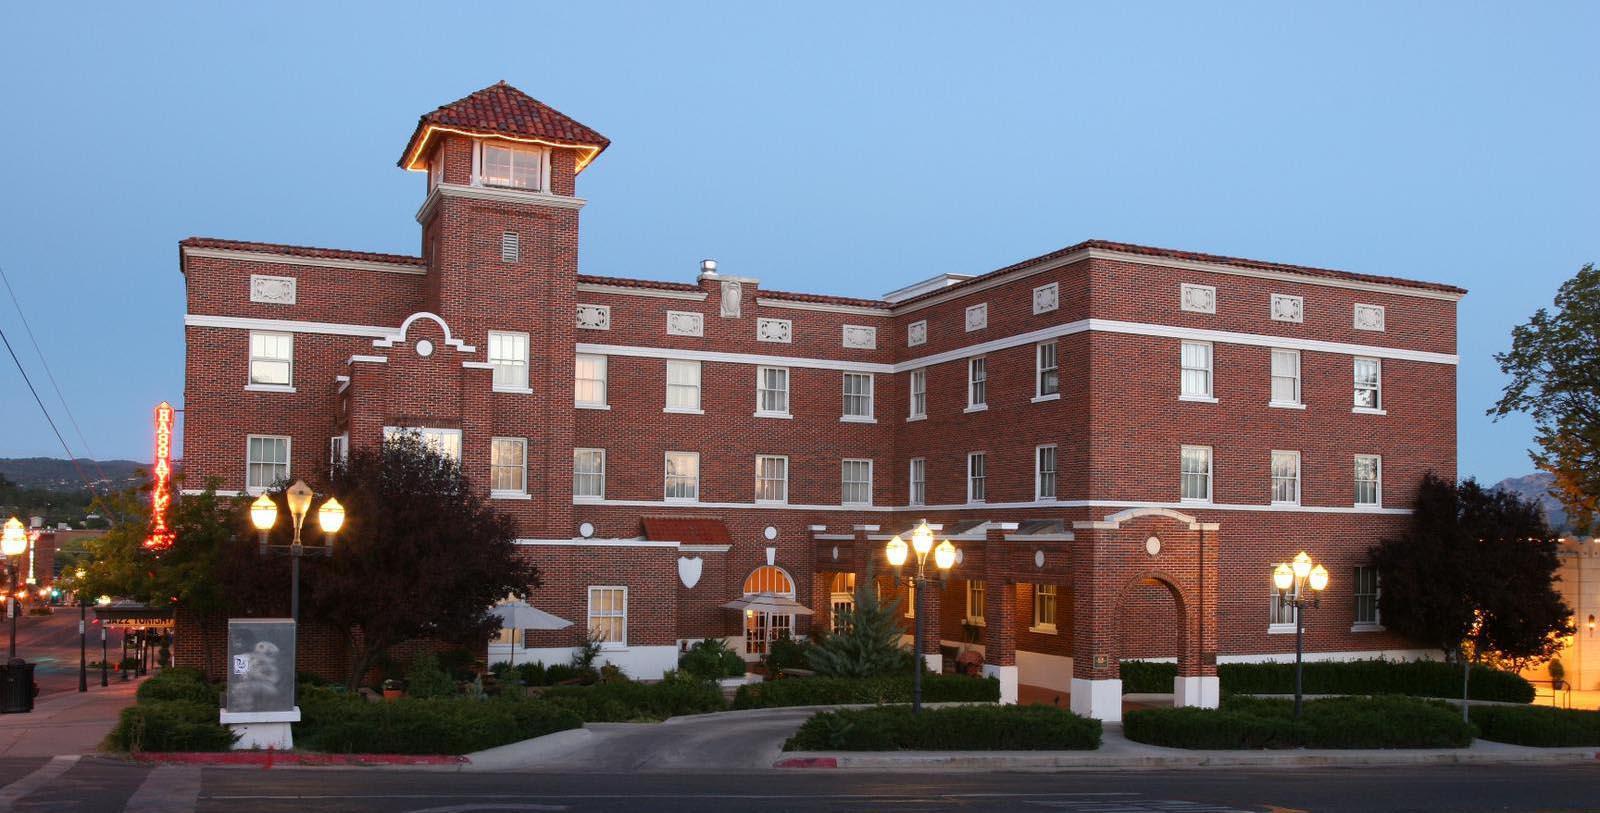 Image of hotel exterior Hassayampa Inn, 1927, Member of Historic Hotels of America, in Prescott, Arizona, Special Offers, Discounted Rates, Families, Romantic Escape, Honeymoons, Anniversaries, Reunions